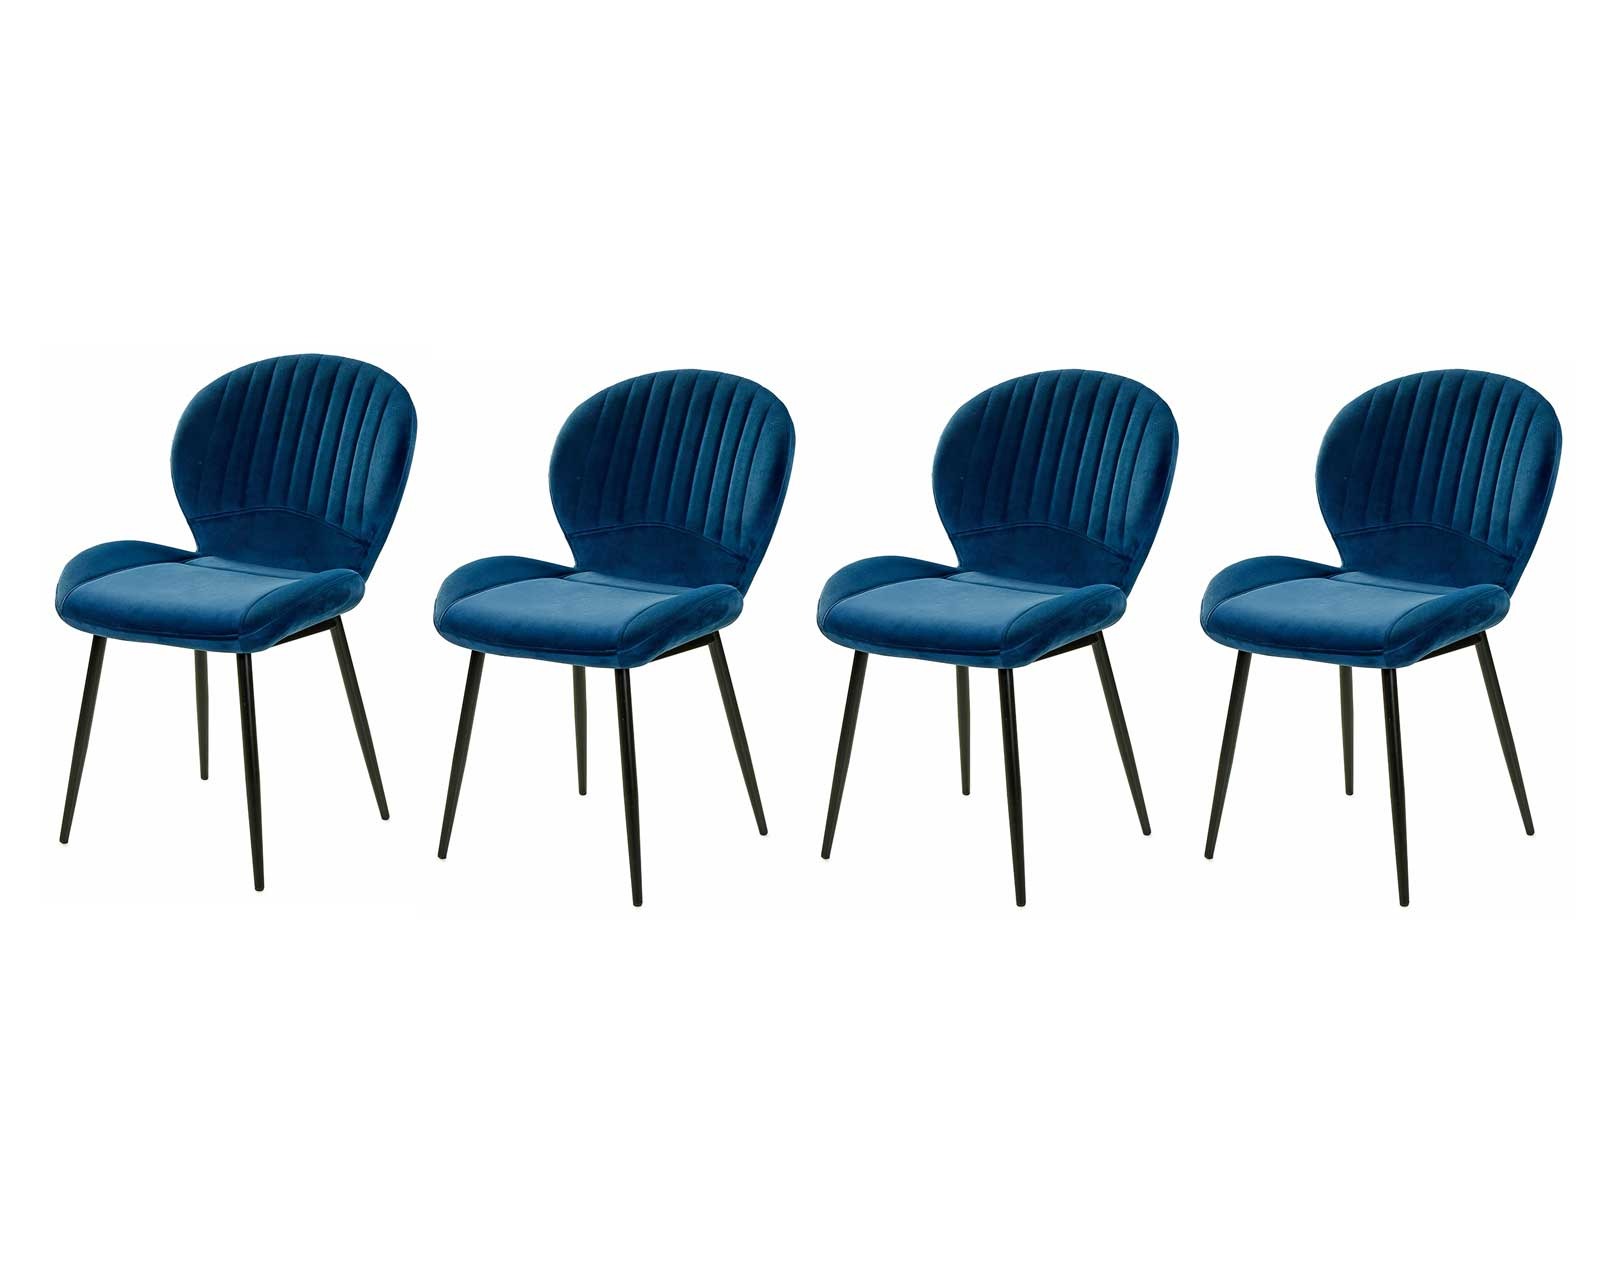 Lifestyle4Living 4er-Set Stühle in Samt blau, Gestell Metall schwarz, gepolstert, Maße B/H/T ca. 52/84/59 cm